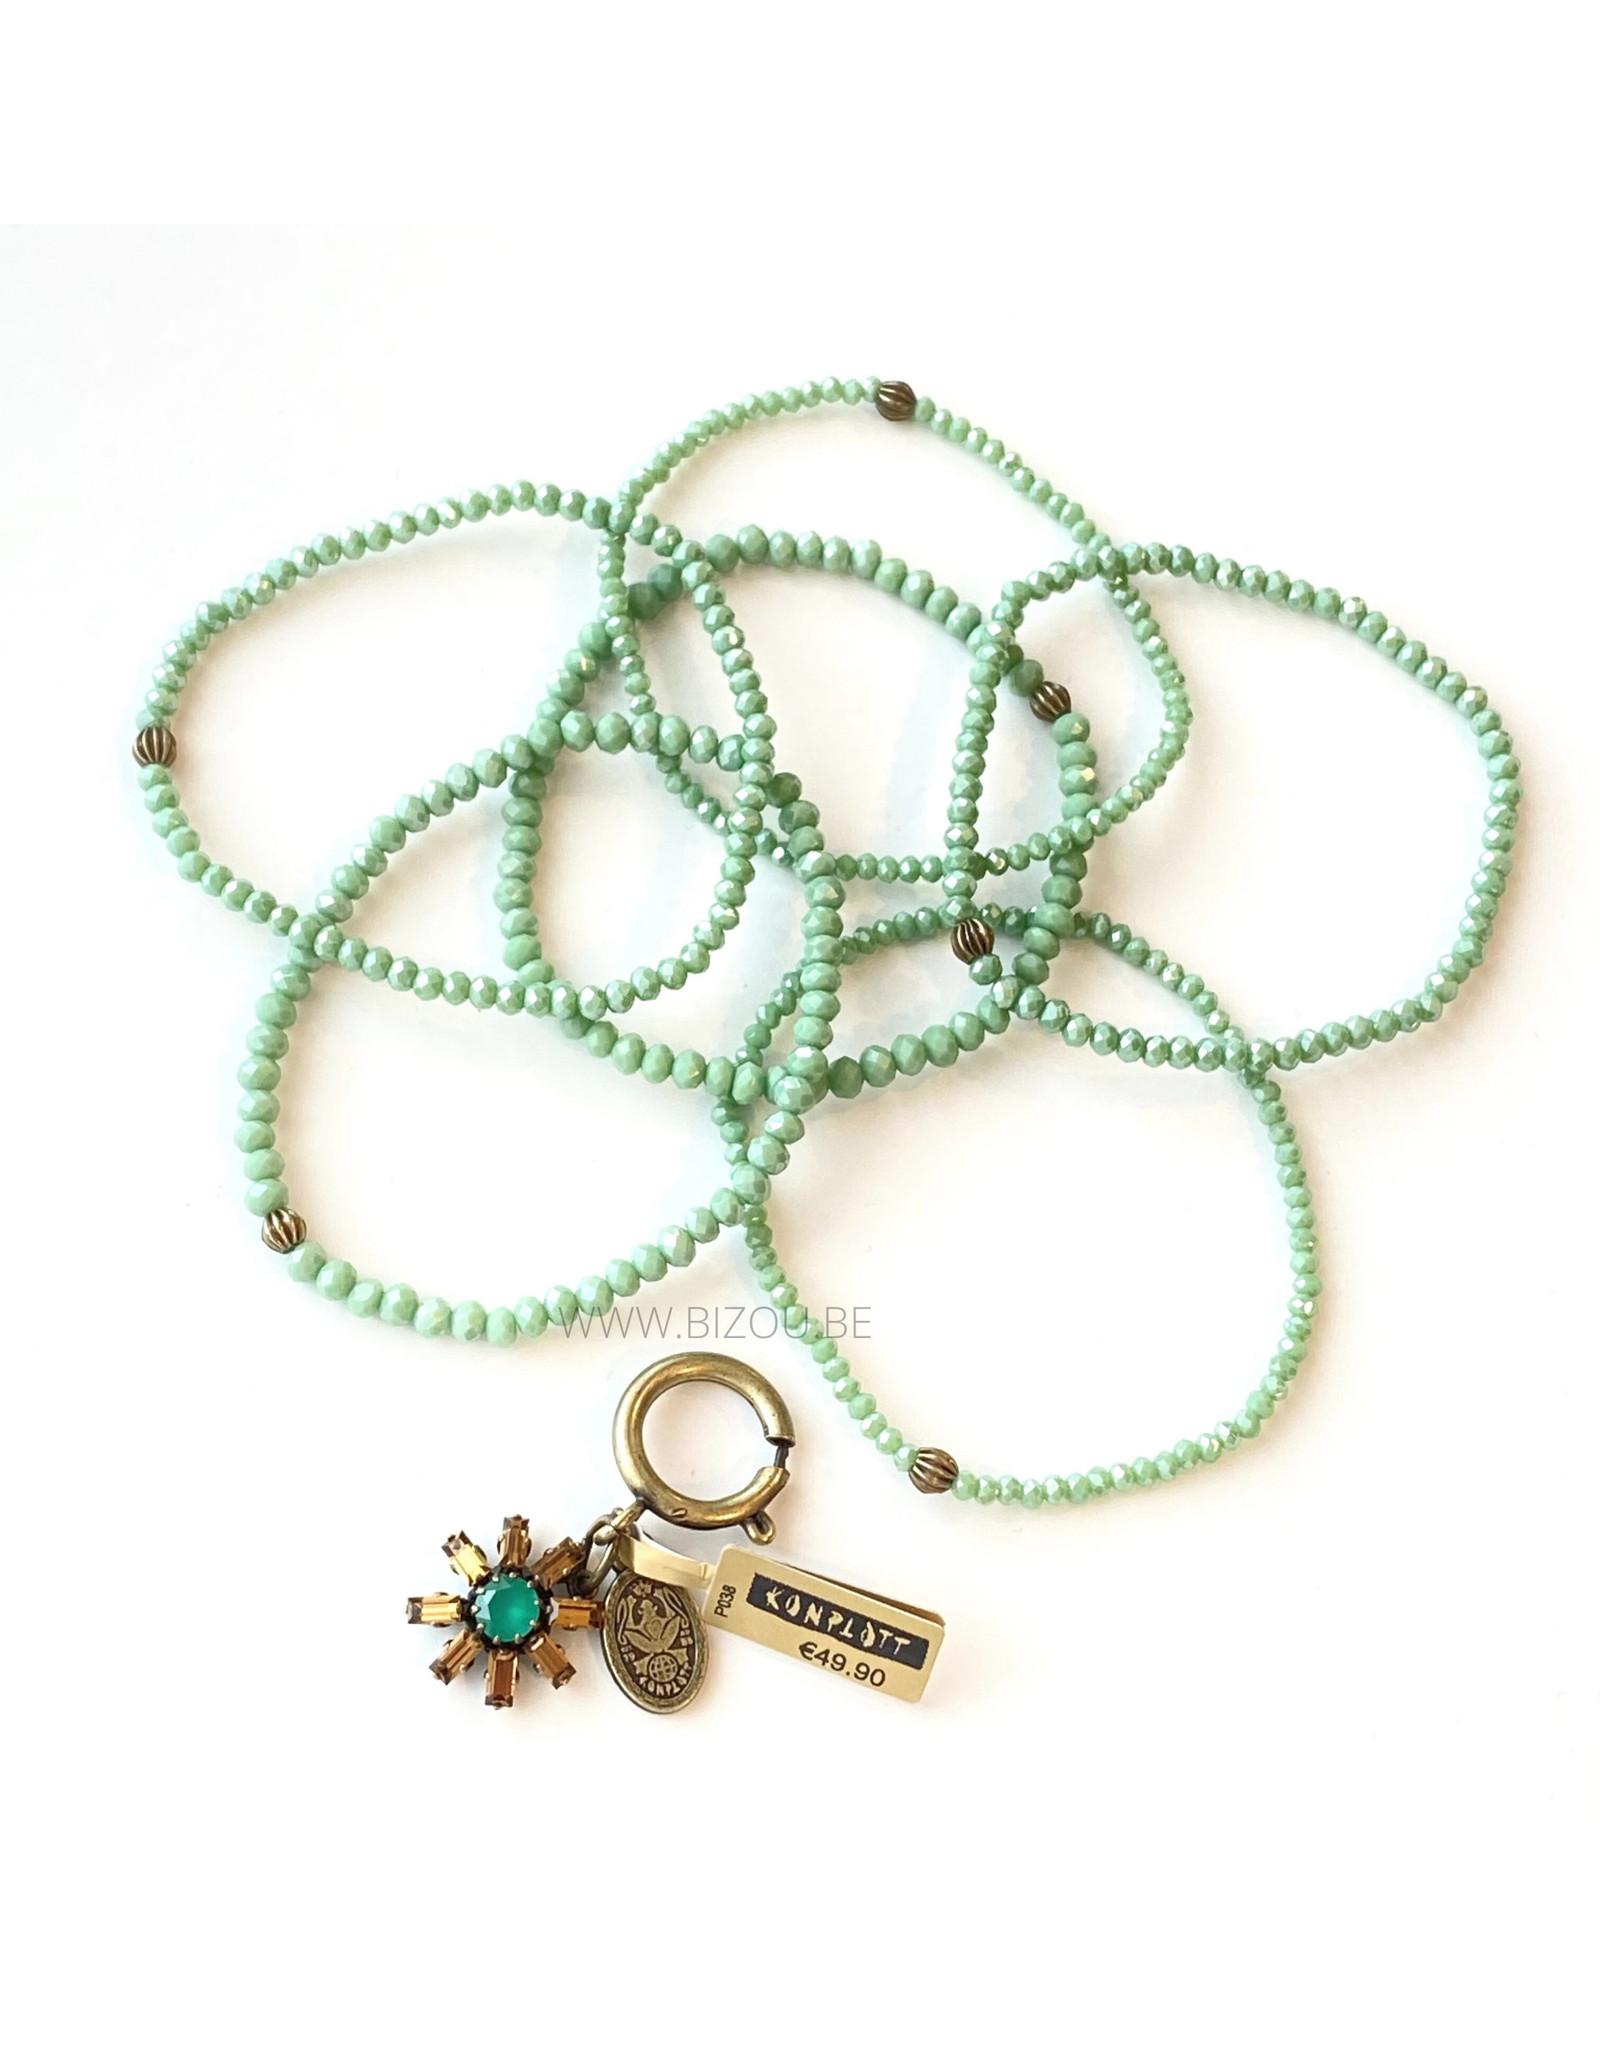 Konplott Daisy Spider - Groen Armband